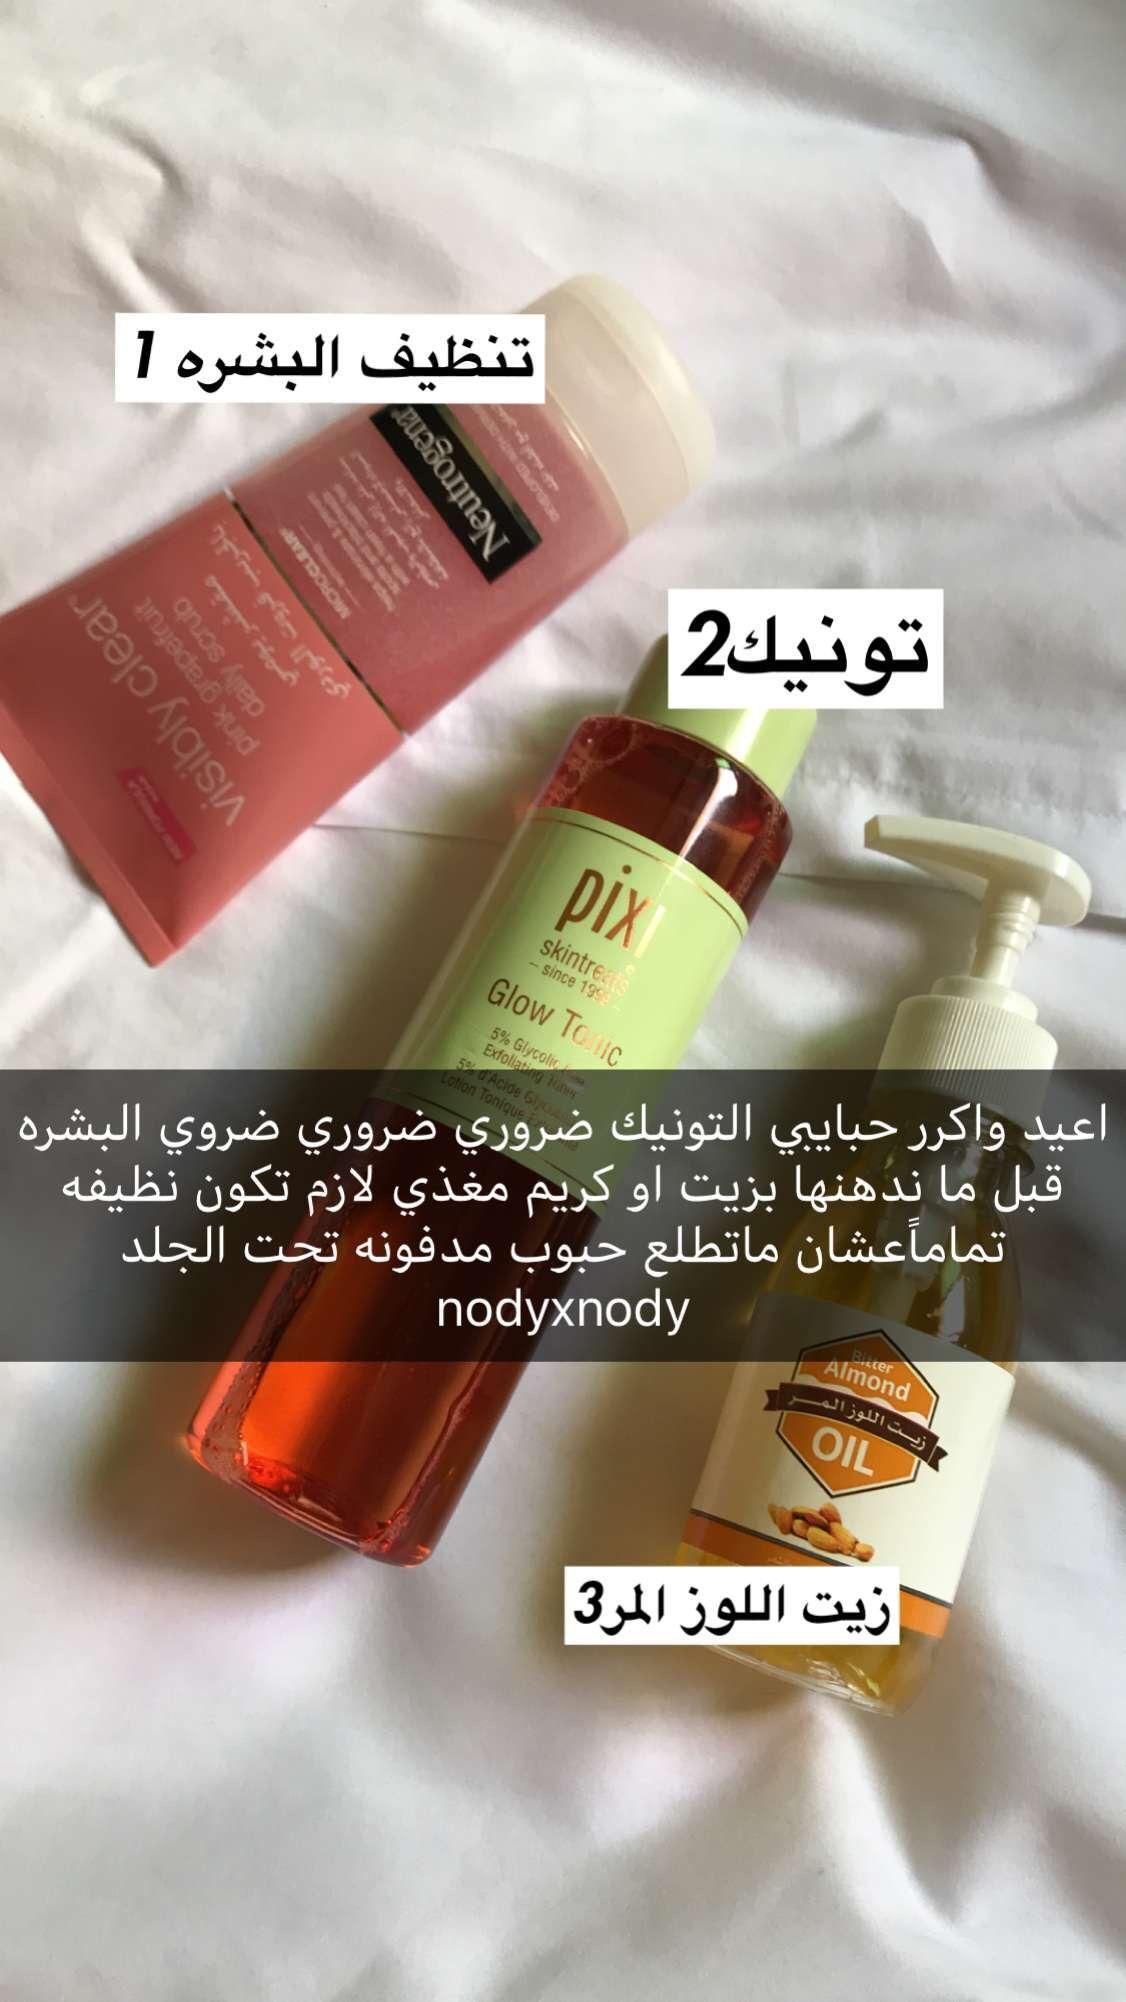 Pin By Lubna Alnaime On عناية Beauty Skin Care Routine Pretty Skin Care Skin Care Diy Masks